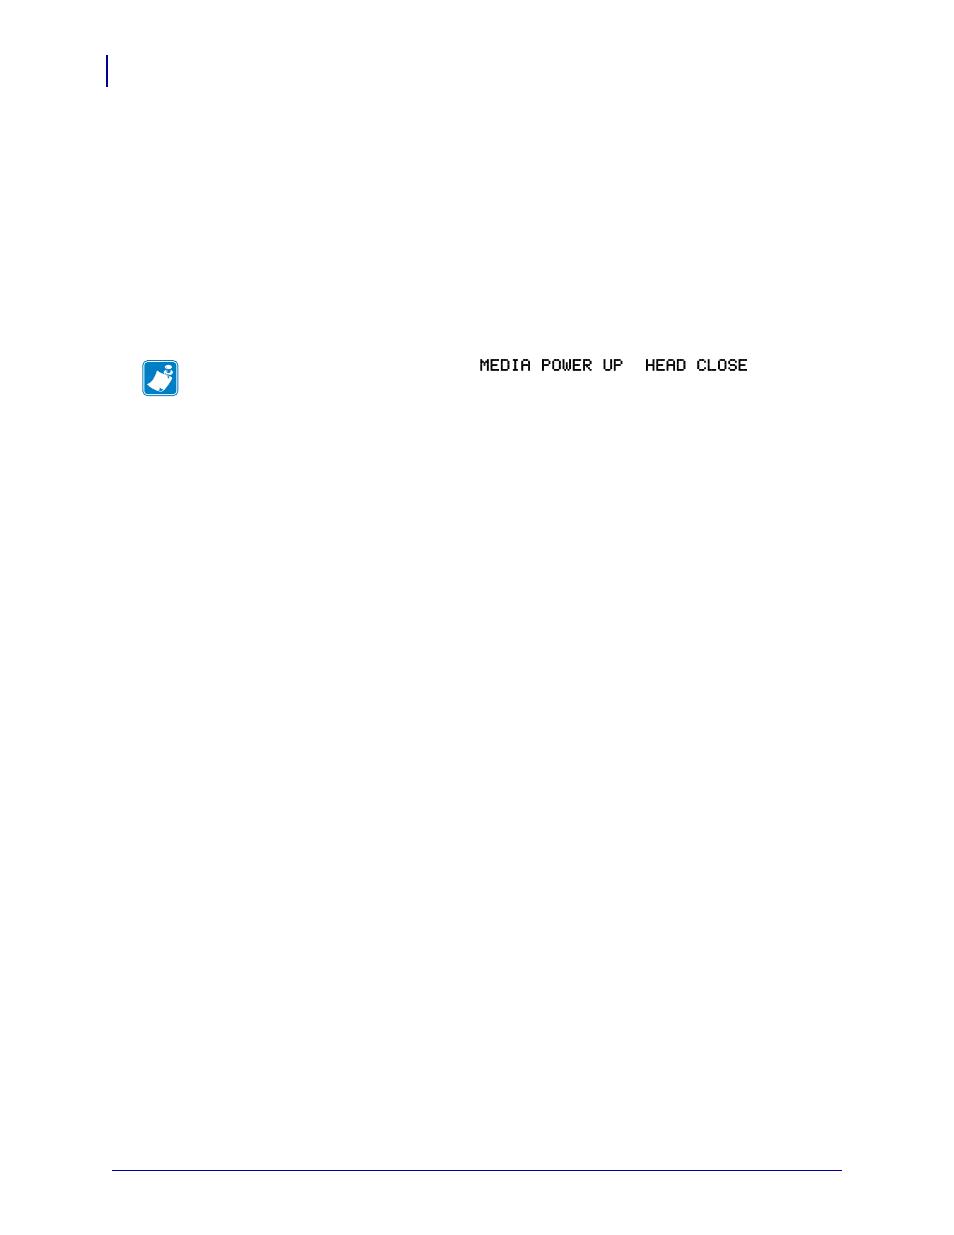 Calibrate the printer, Auto calibration, Manual calibration